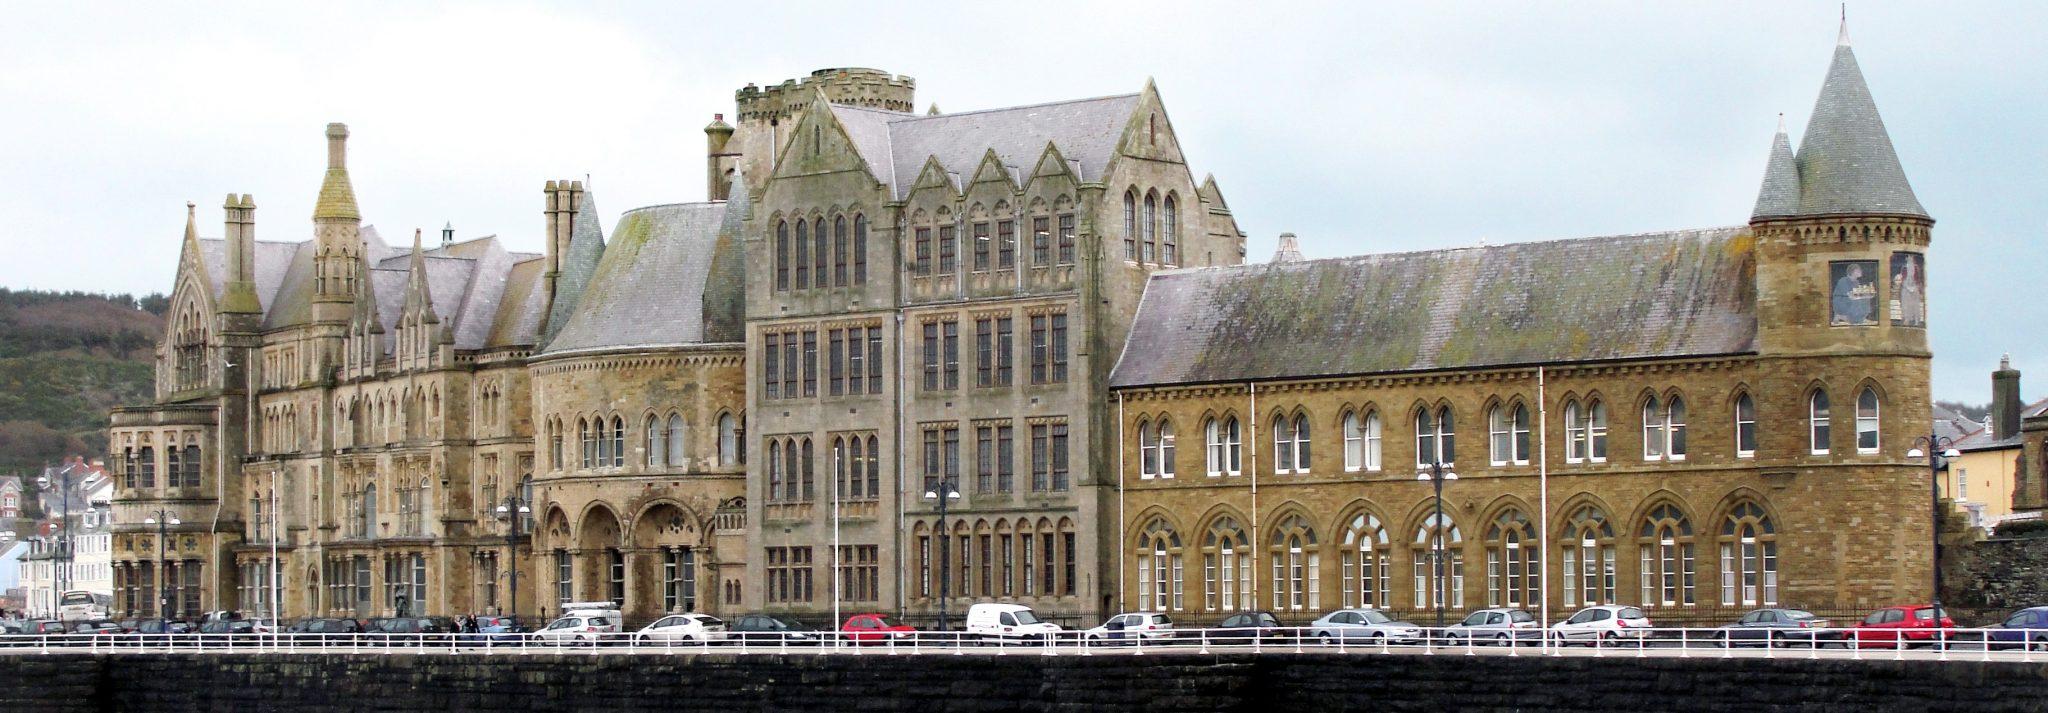 Aberystwyth University Old College